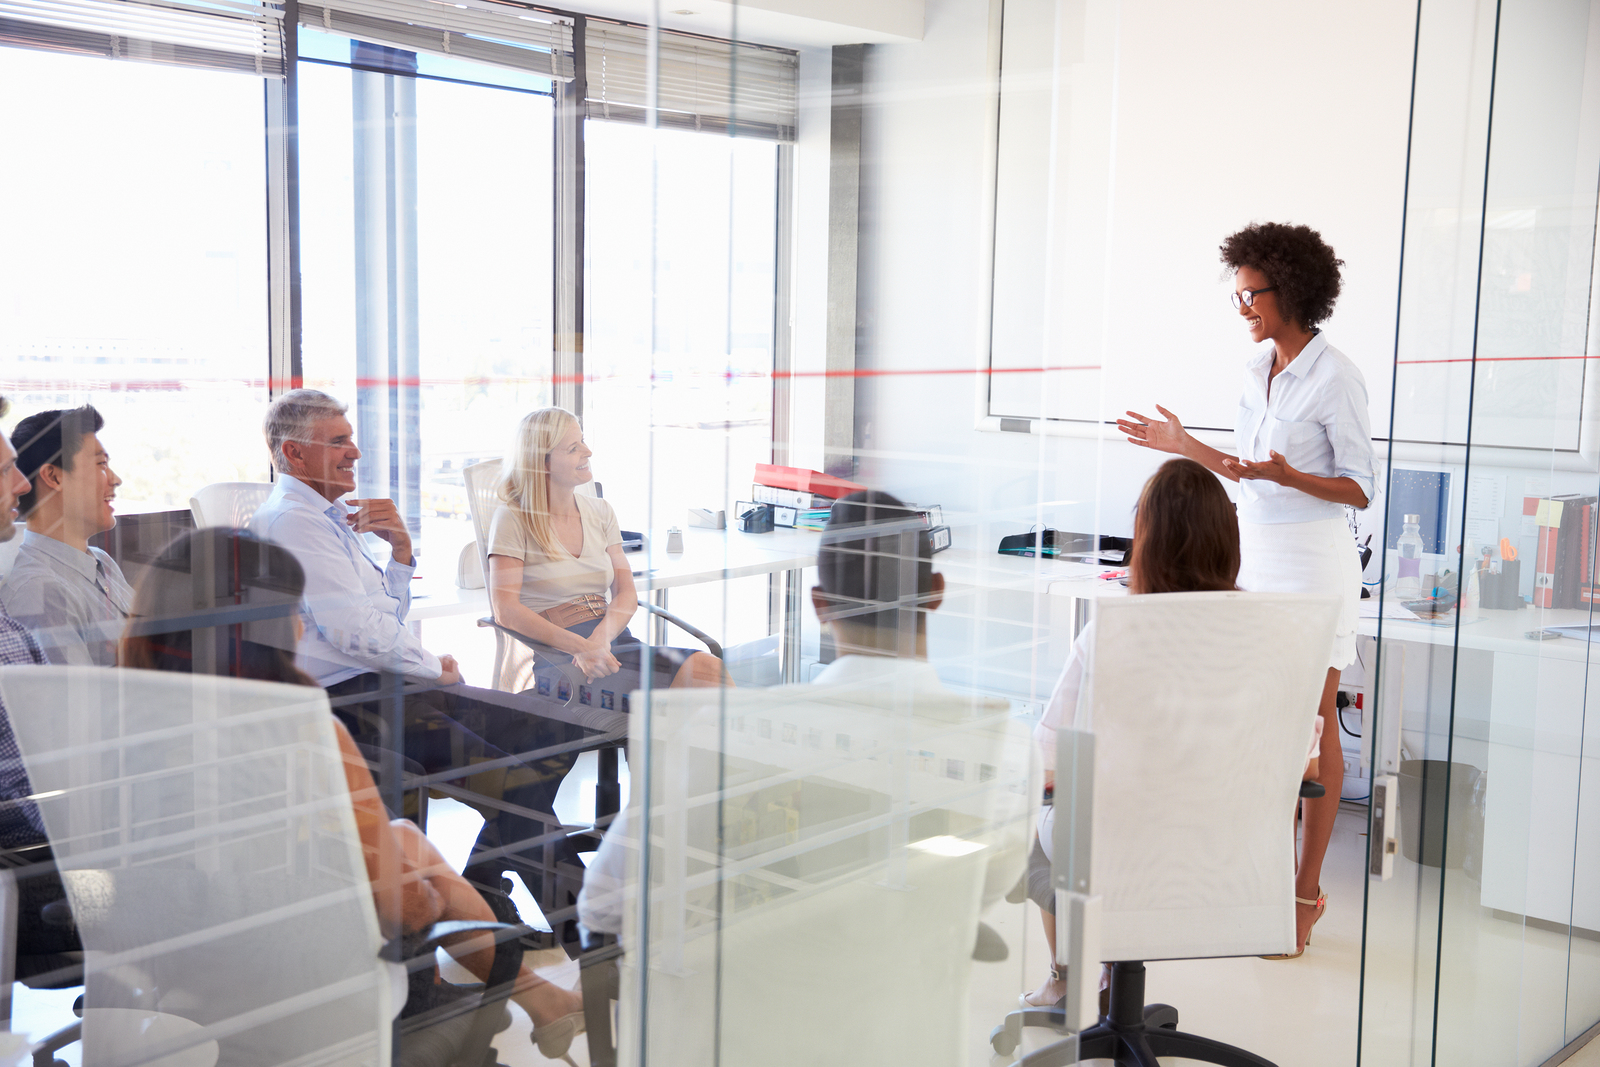 Bigstock_ 109841155 - Business meeting in a modern office.jpg